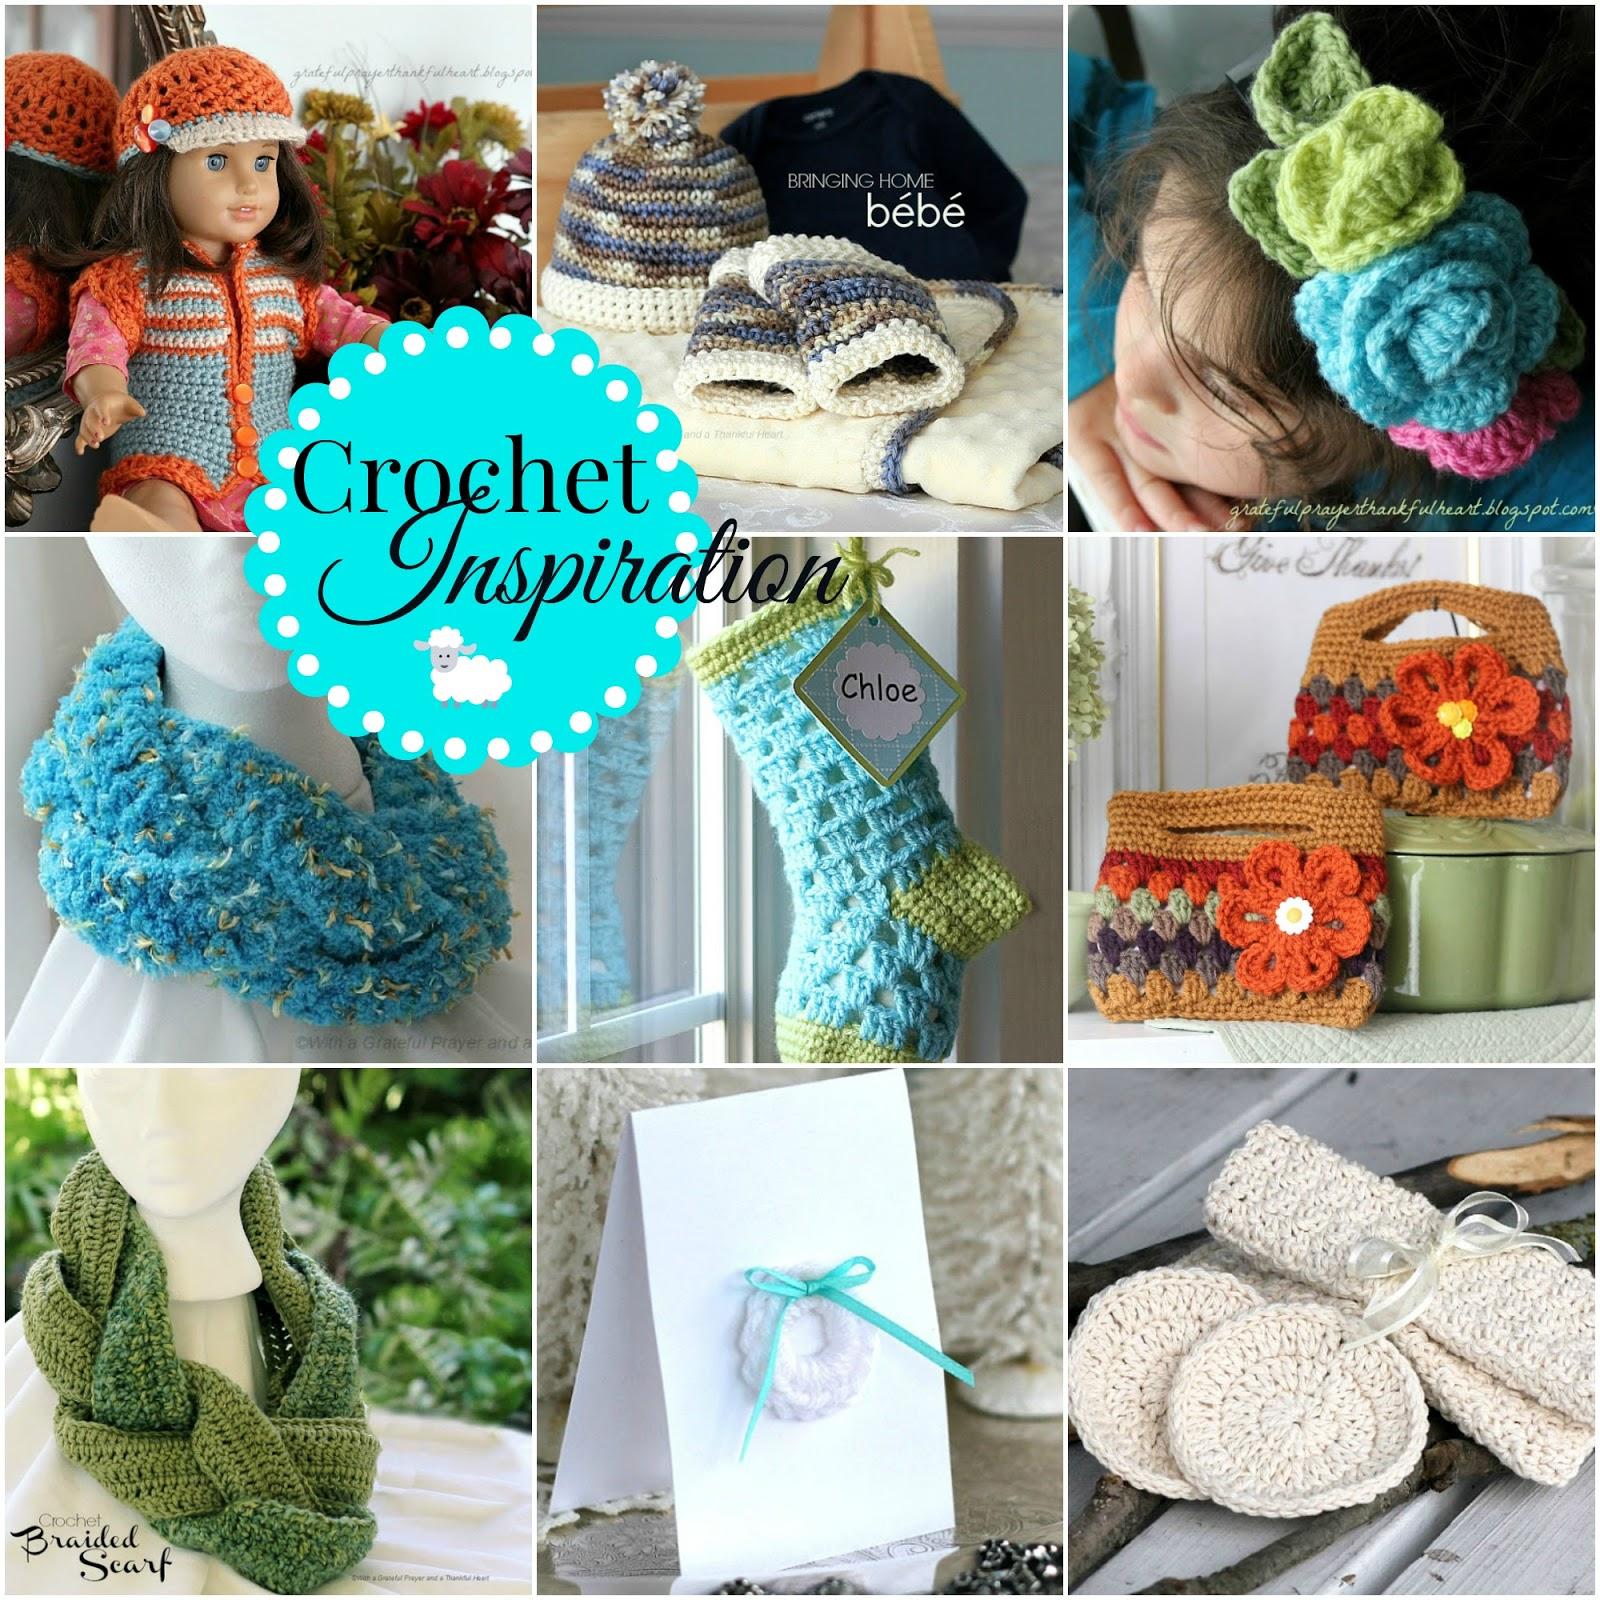 Inspiration Ideas: Crochet Inspiration And Gift Ideas